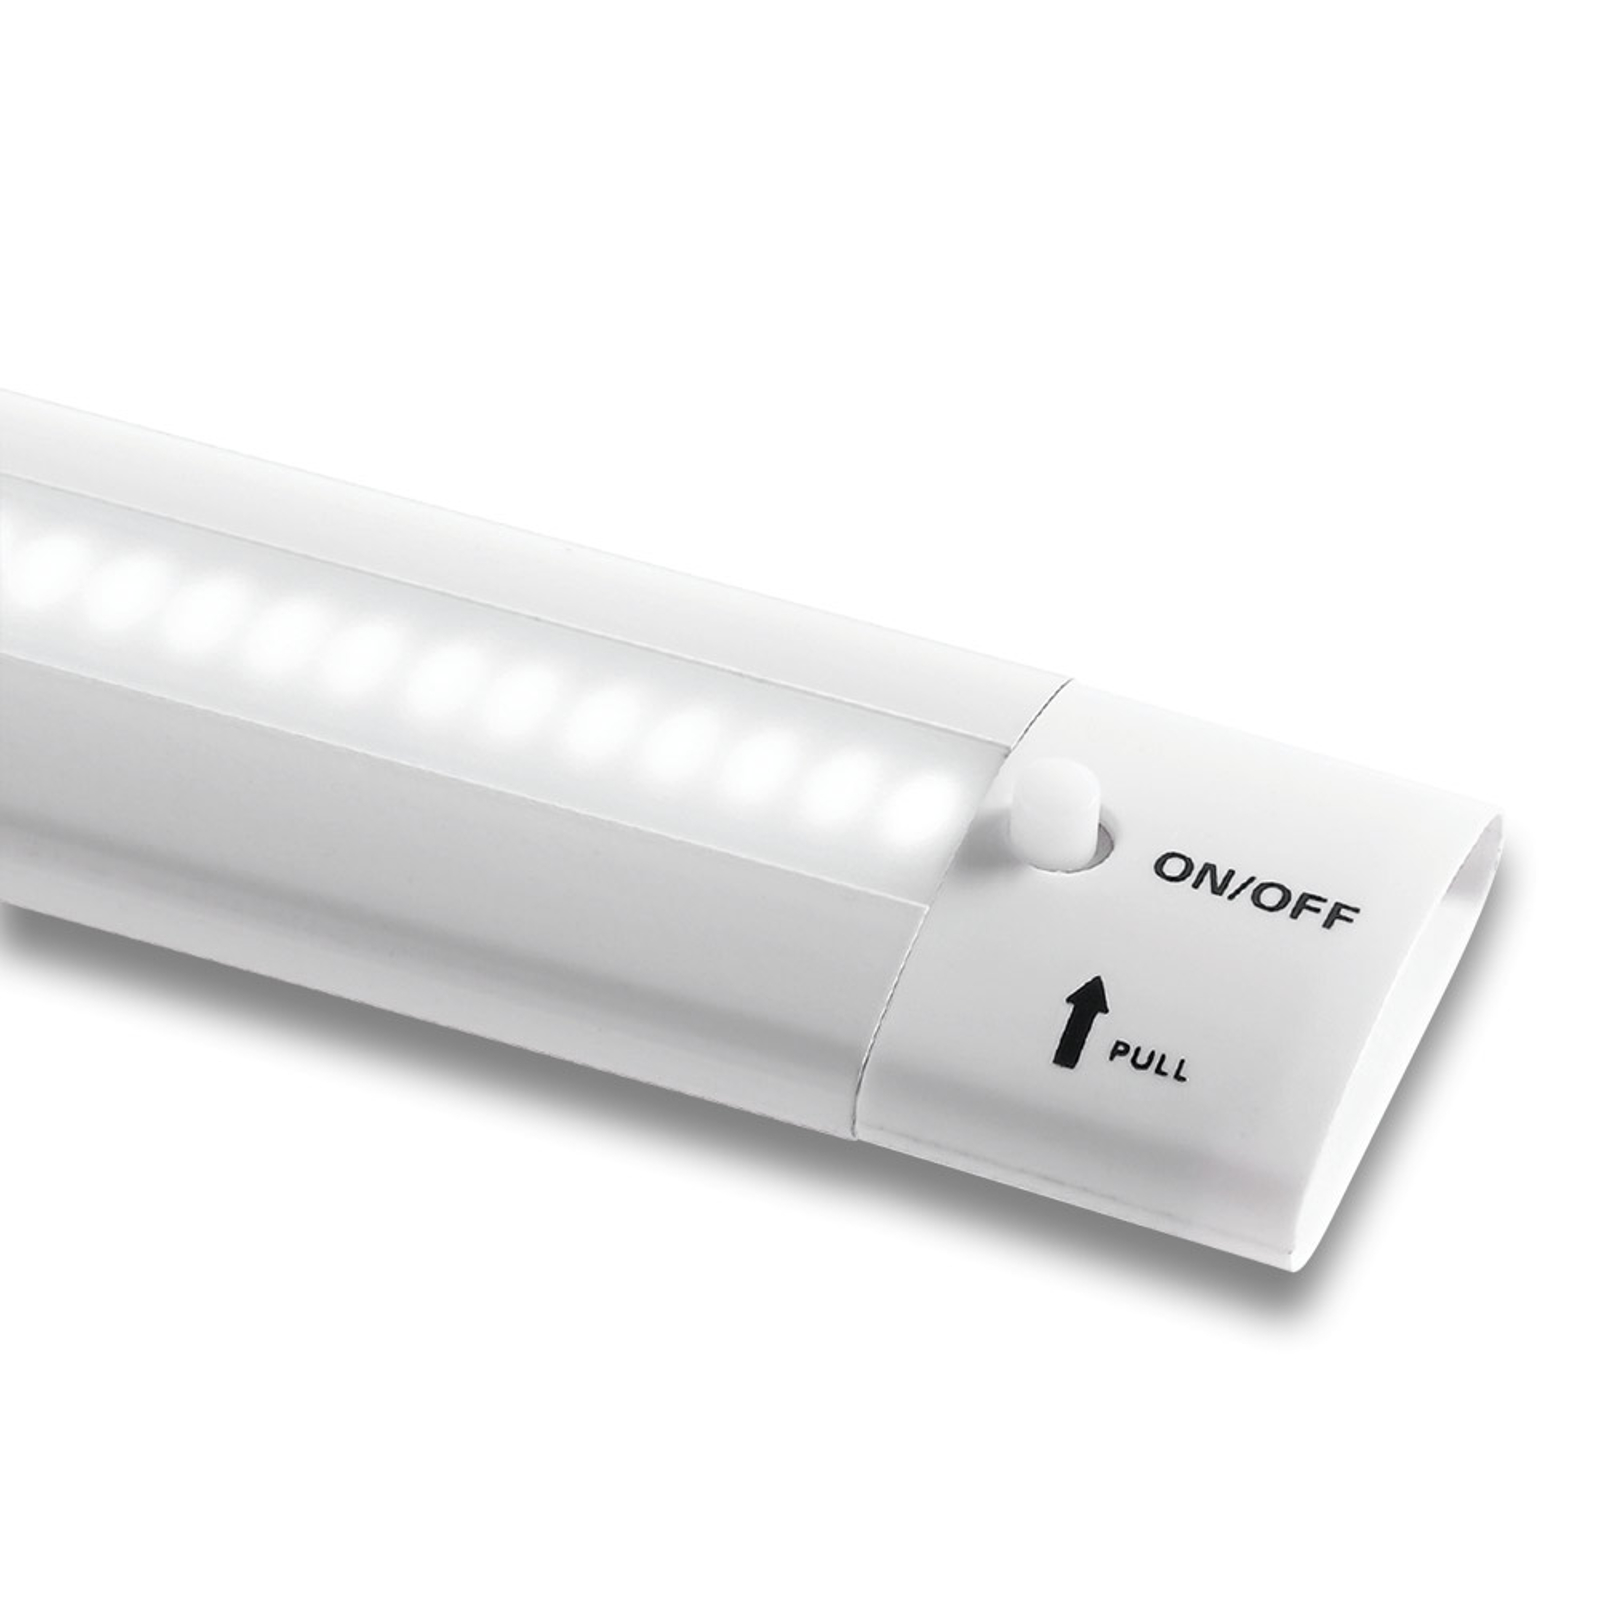 LED-bänklampa Galway 6690, 16 W, vit